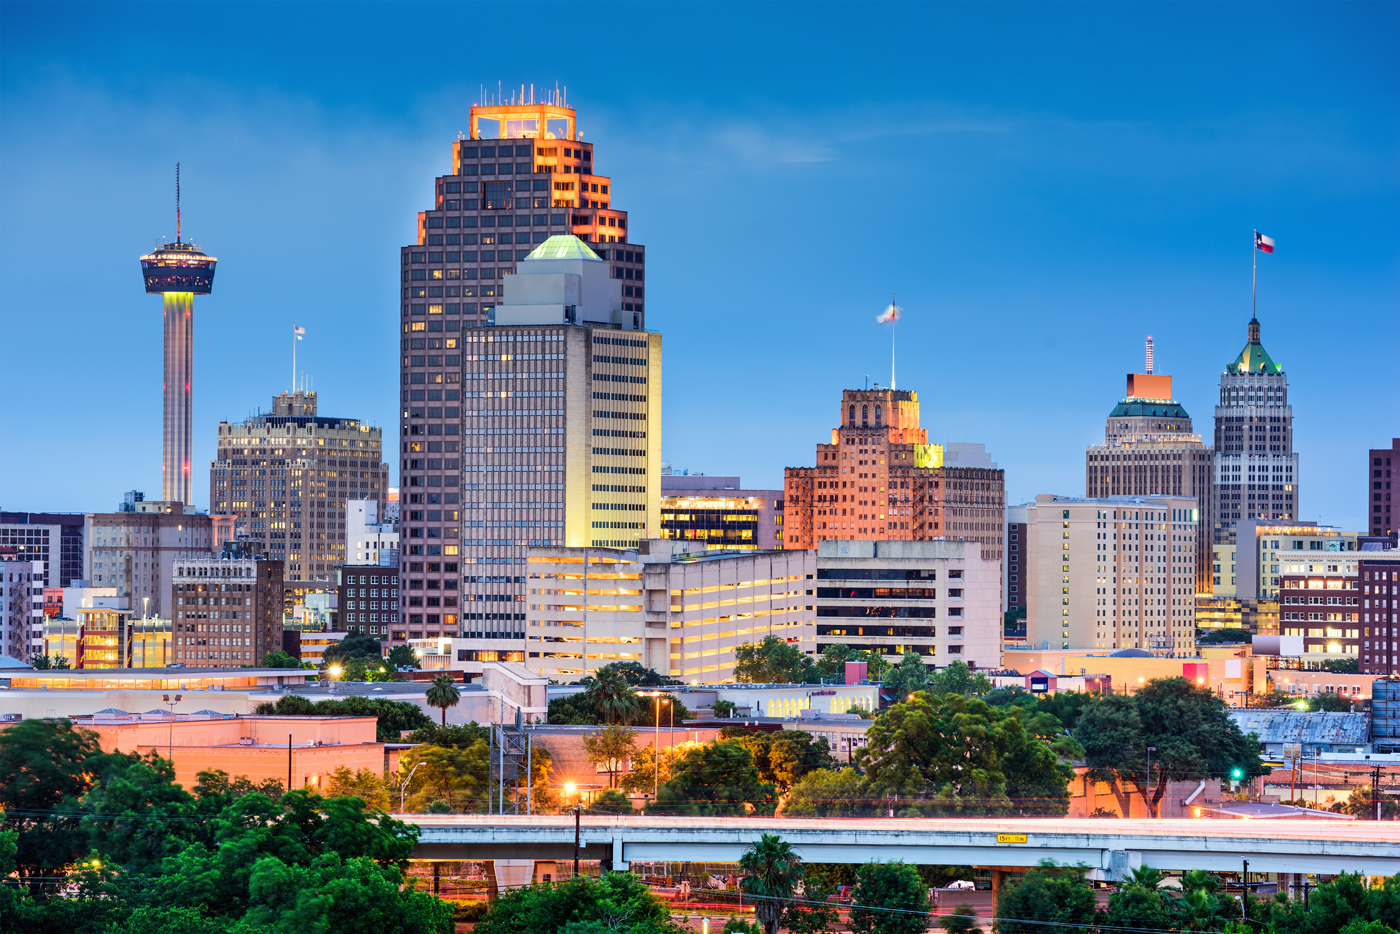 July 16, 2018 - Congressional District Office:727 E Cesar E Chavez Blvd. #B-128San Antonio, TX